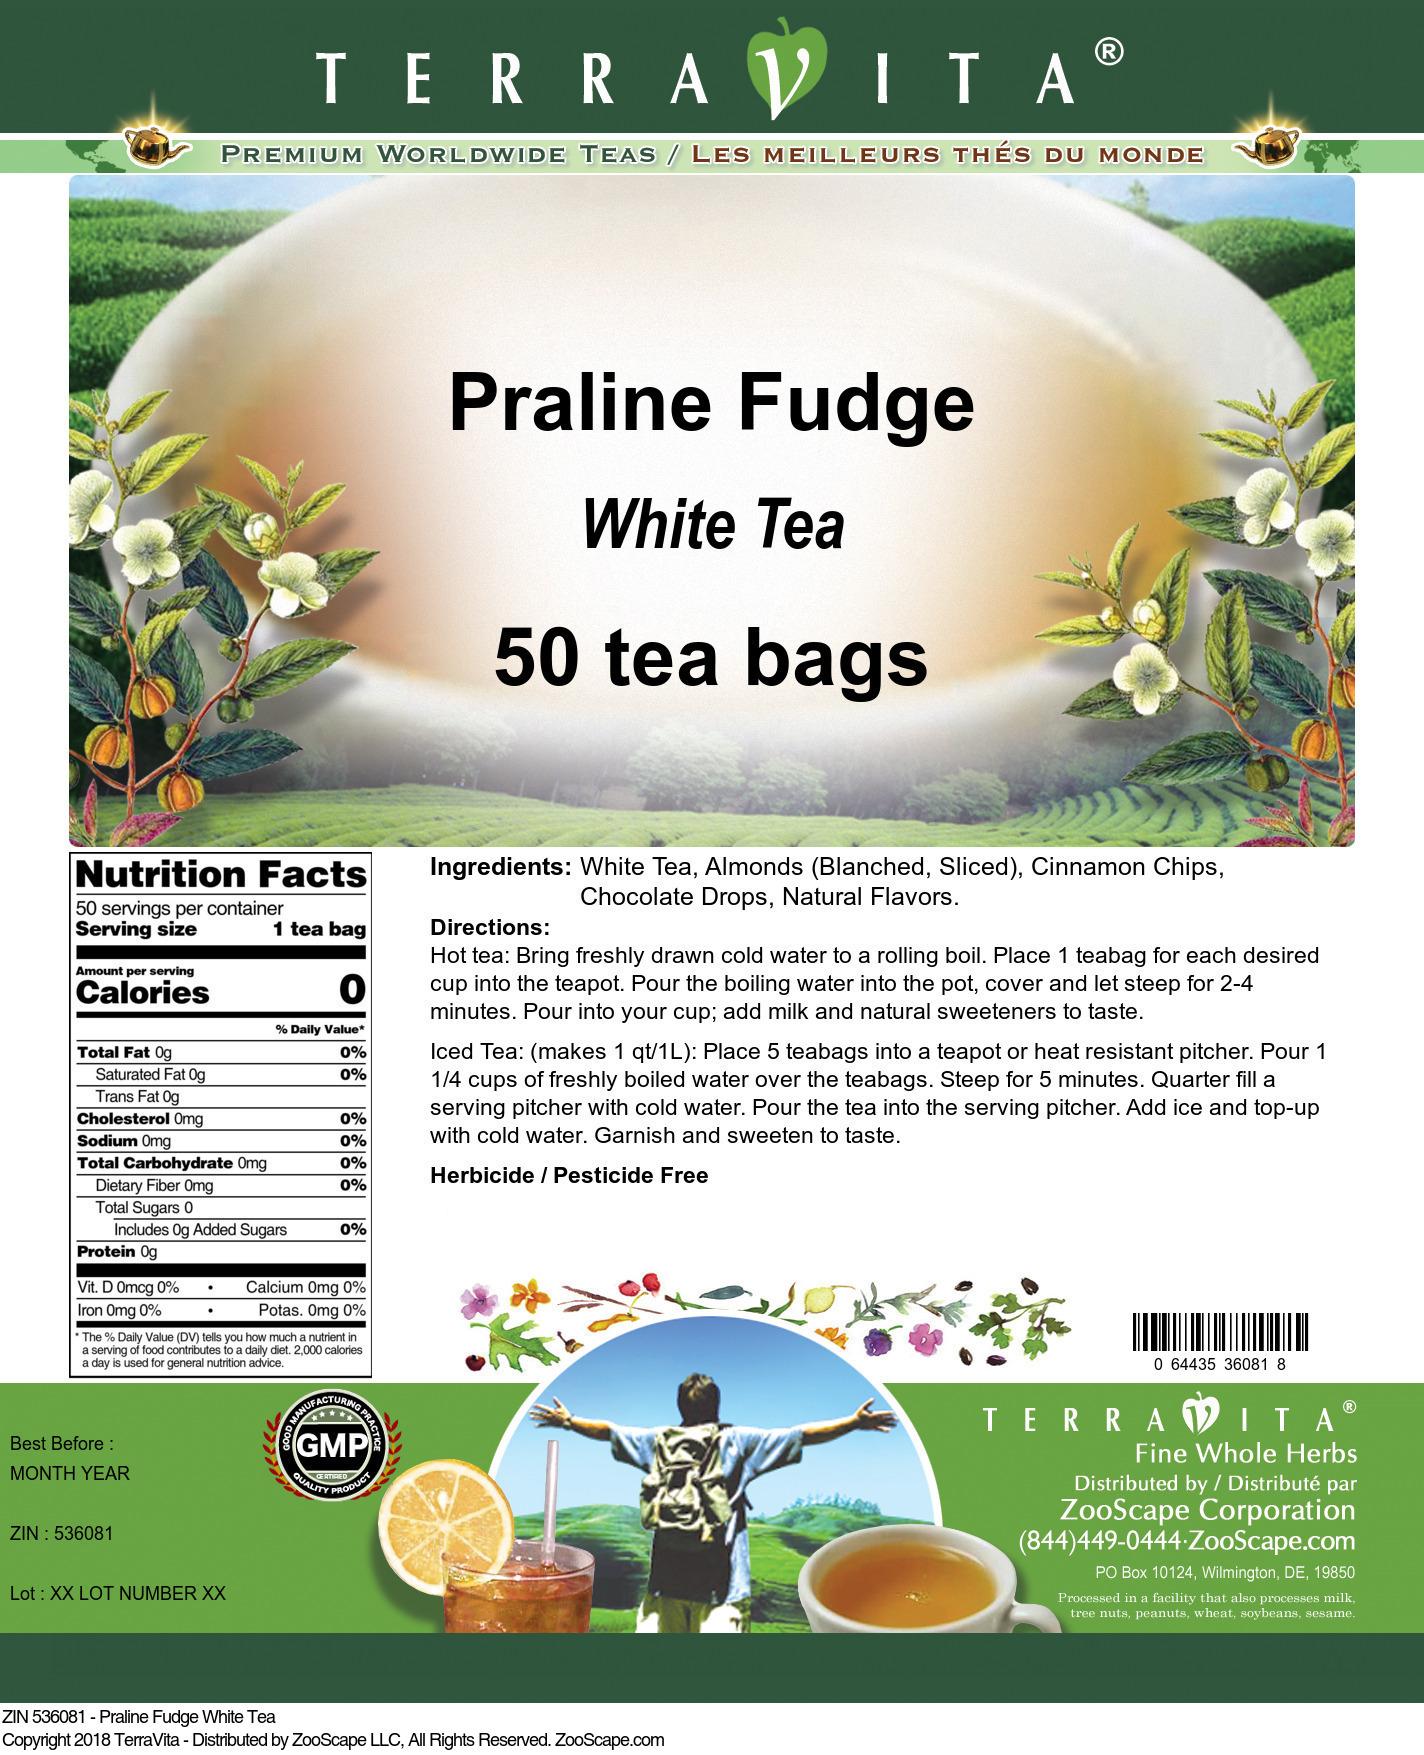 Praline Fudge White Tea